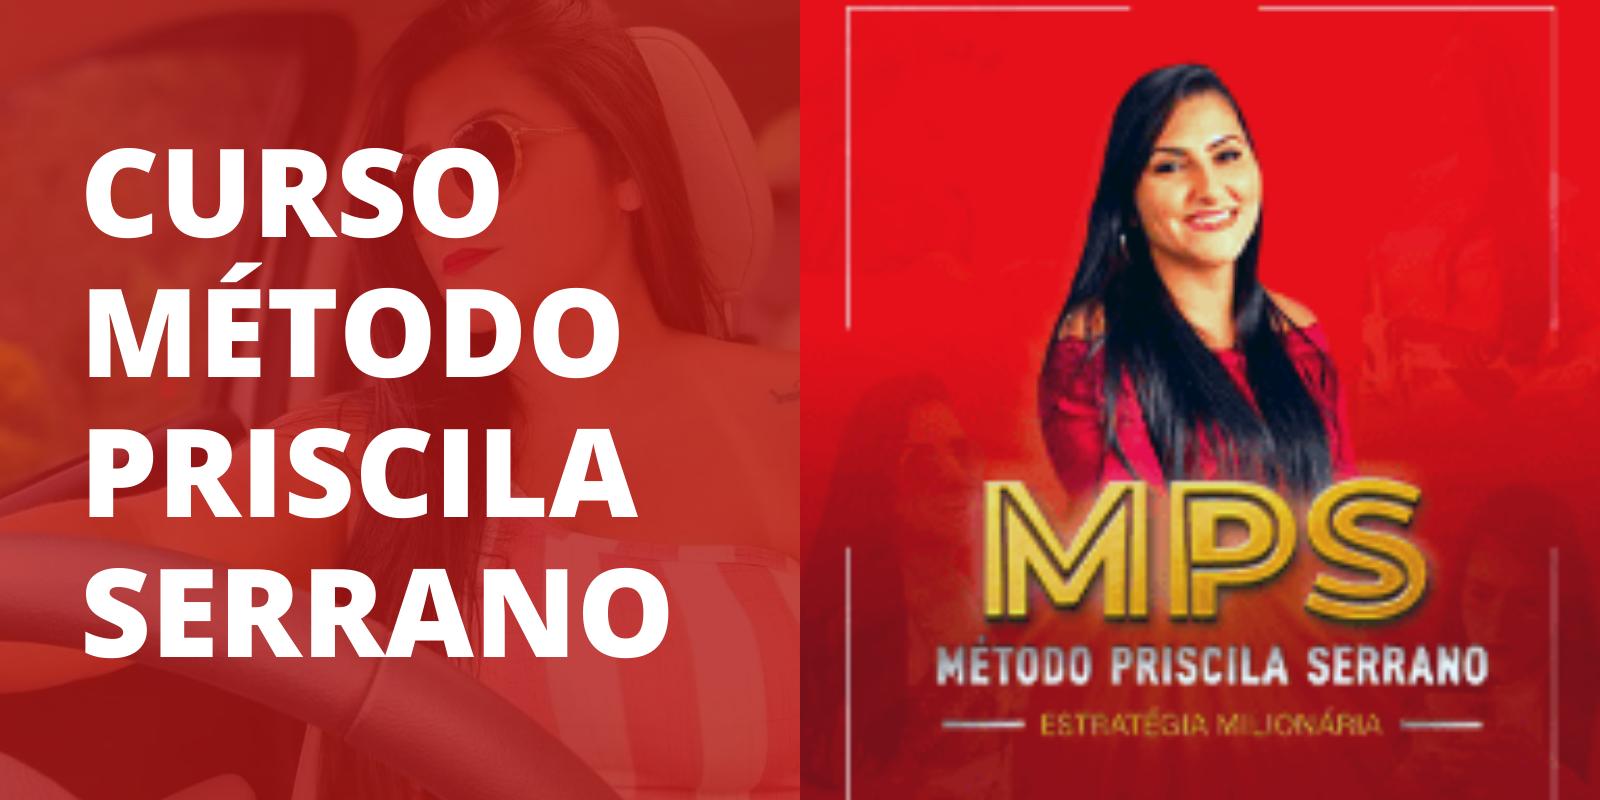 Curso Método Priscila Serrano